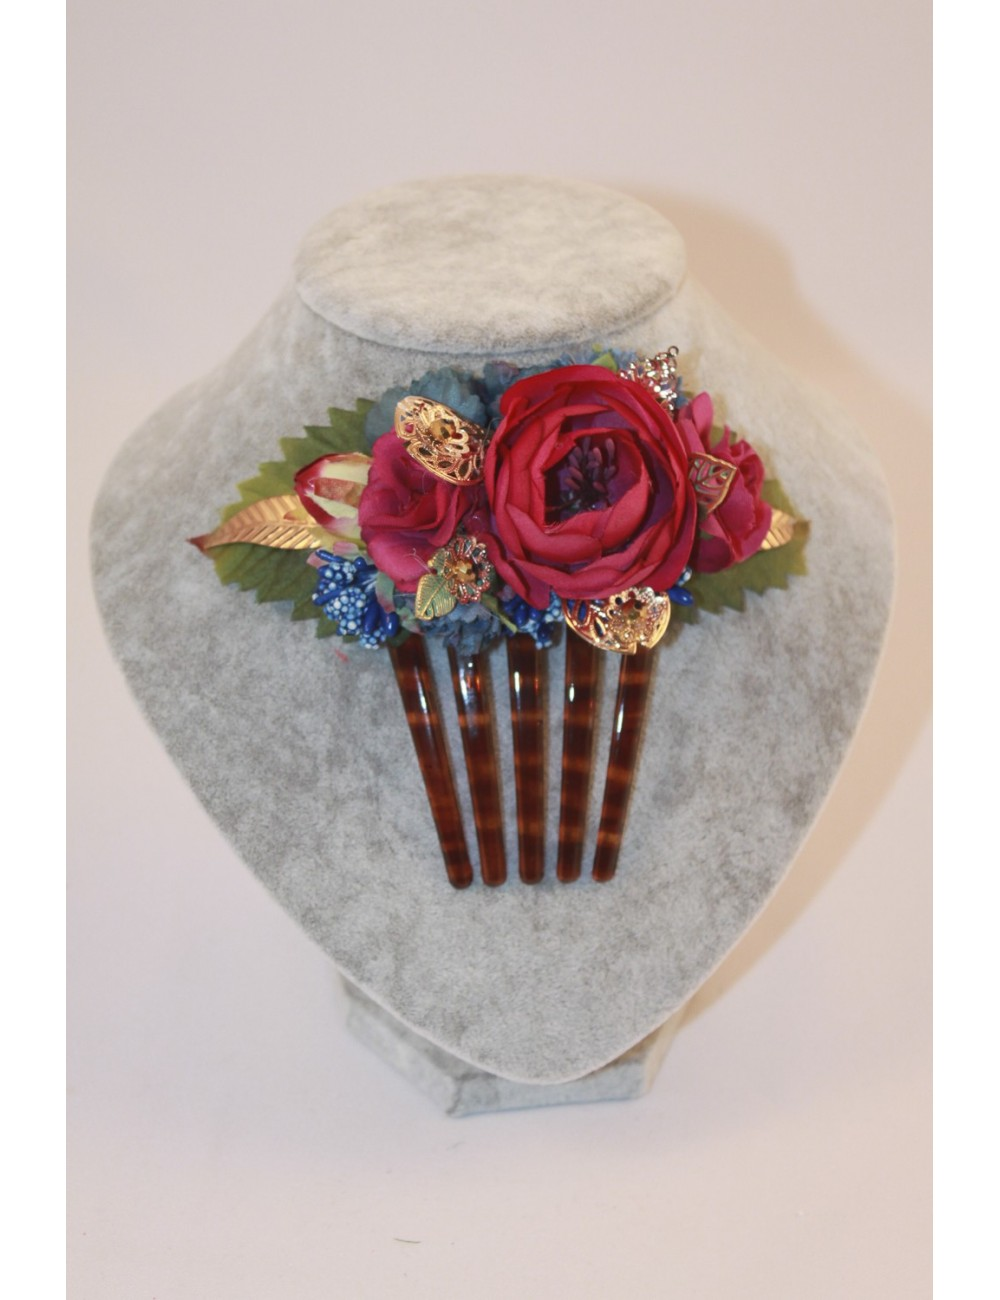 Superbe Peigne fleuris fuchsia/bleu